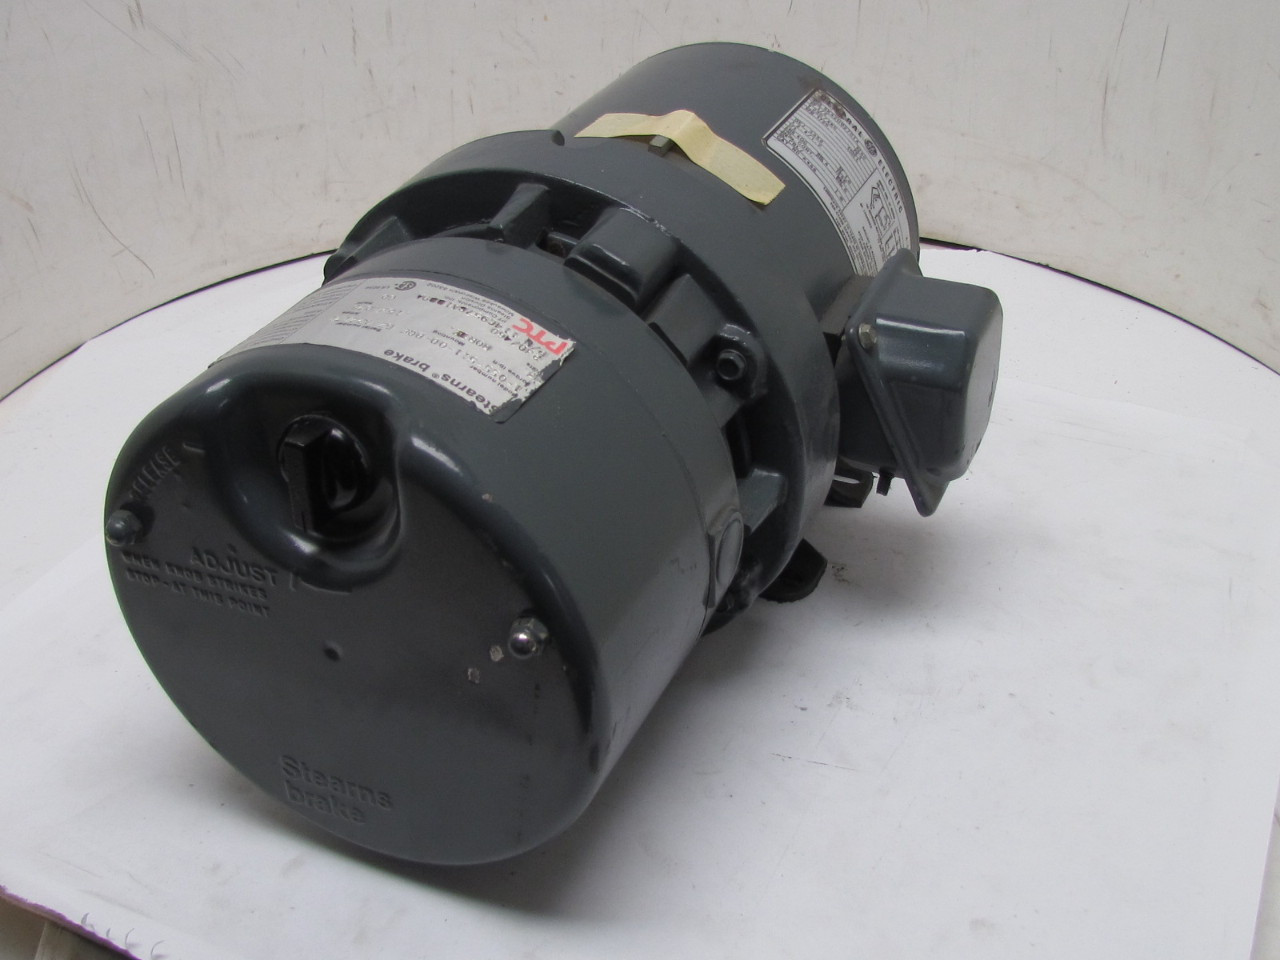 Ge general electric 5k42hg2701a 3ph motor 1 2hp 1725 rpm for Electrical braking of dc motor